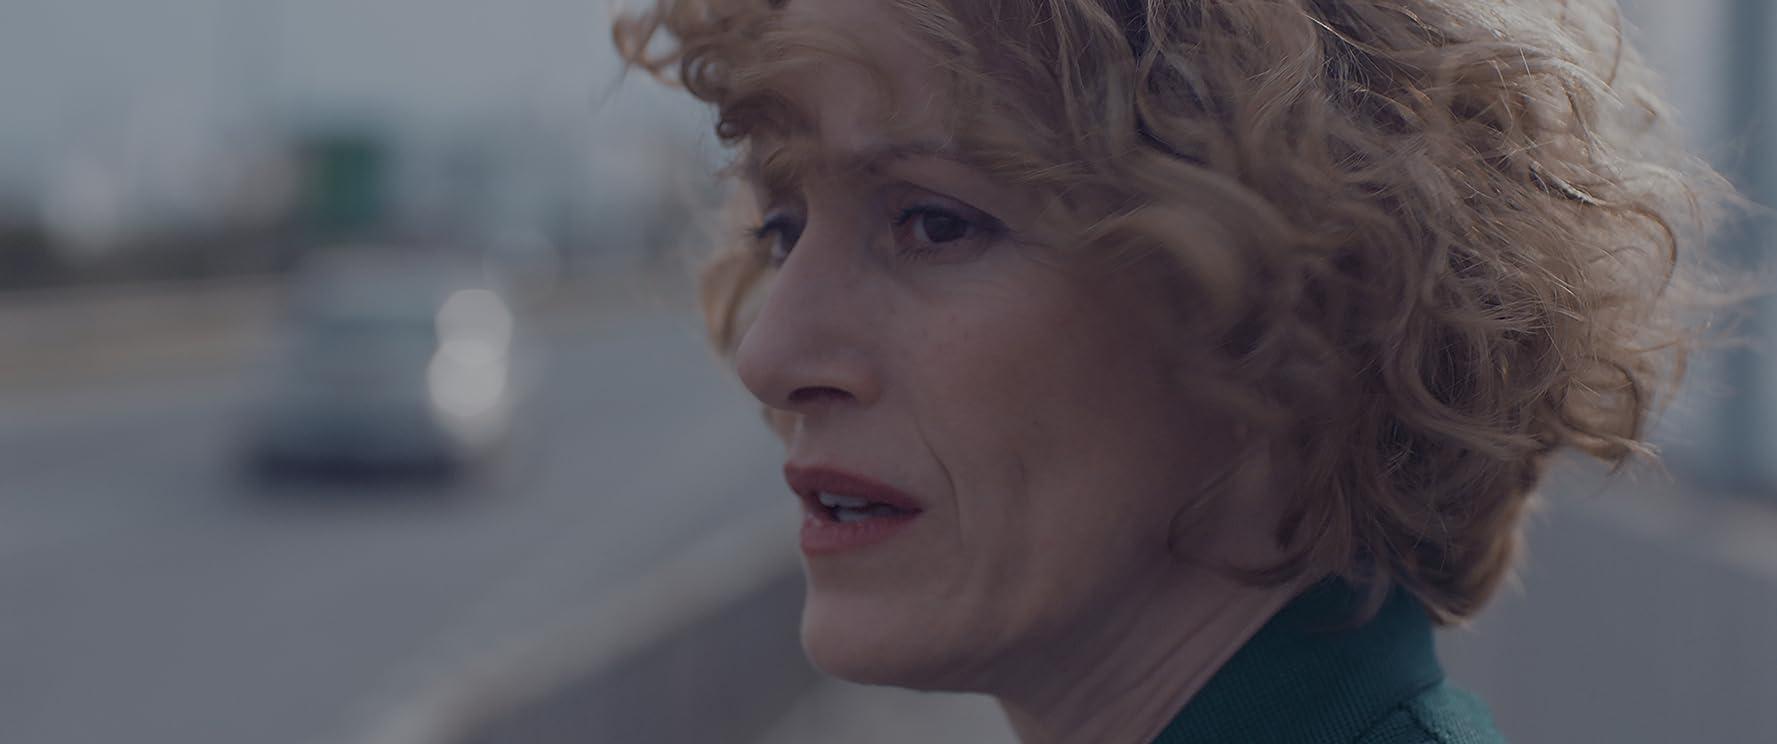 Pause (2018) Online Subtitrat in Romana in HD 1080p